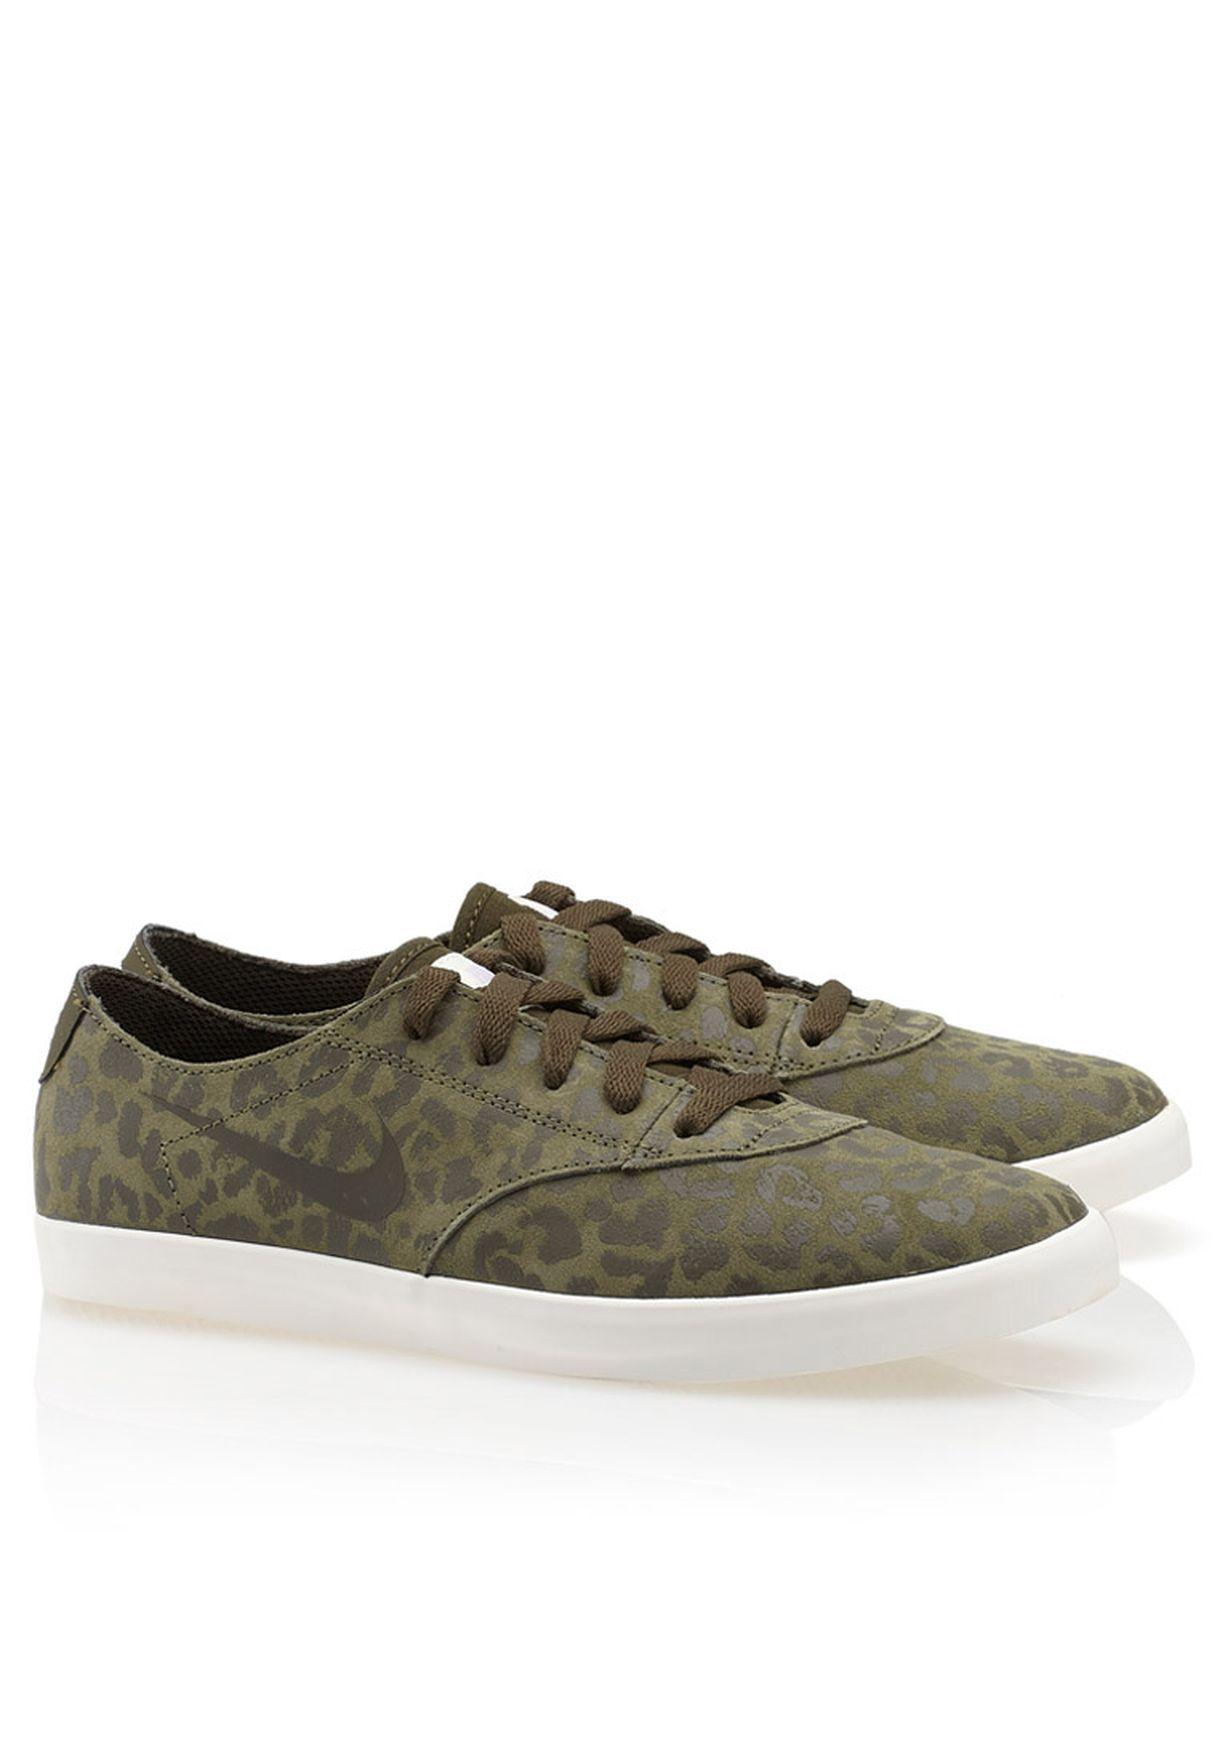 4ca7298d17a6e1 Starlet Saddle Print Sneakers